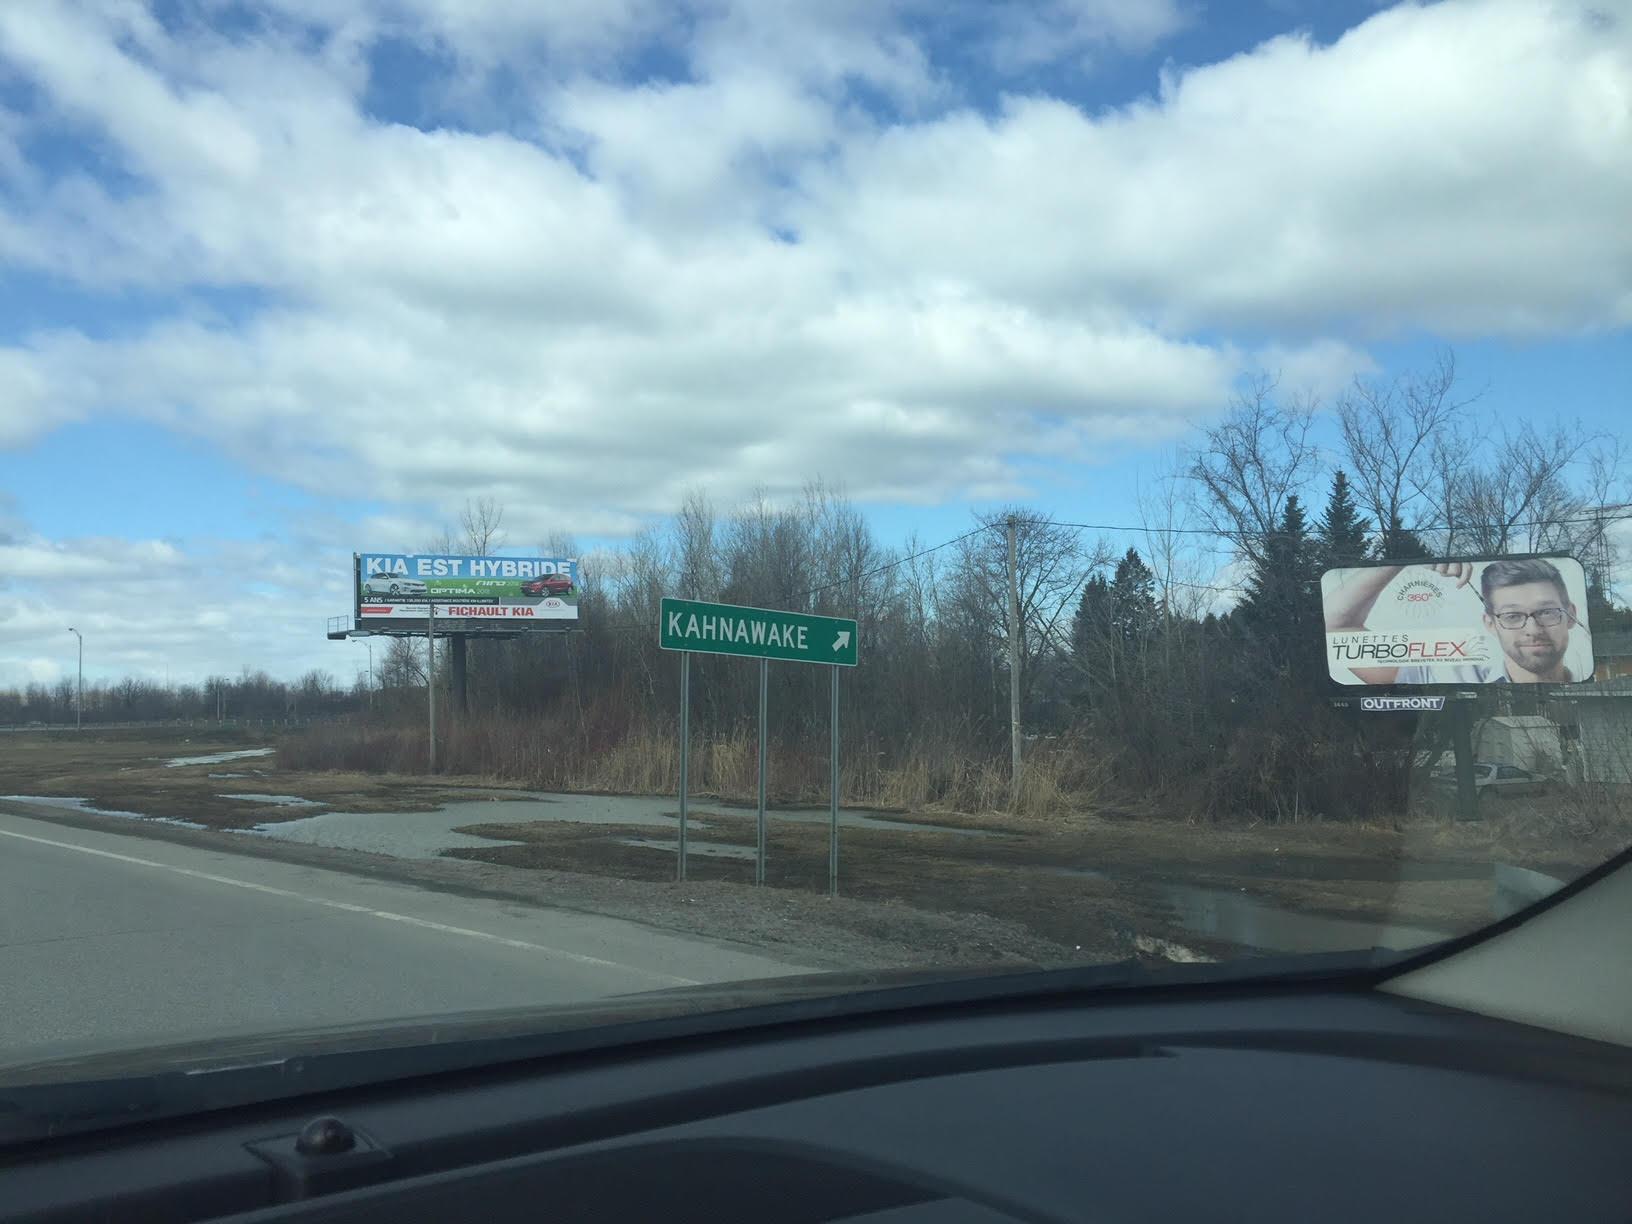 The Kahnawake sign